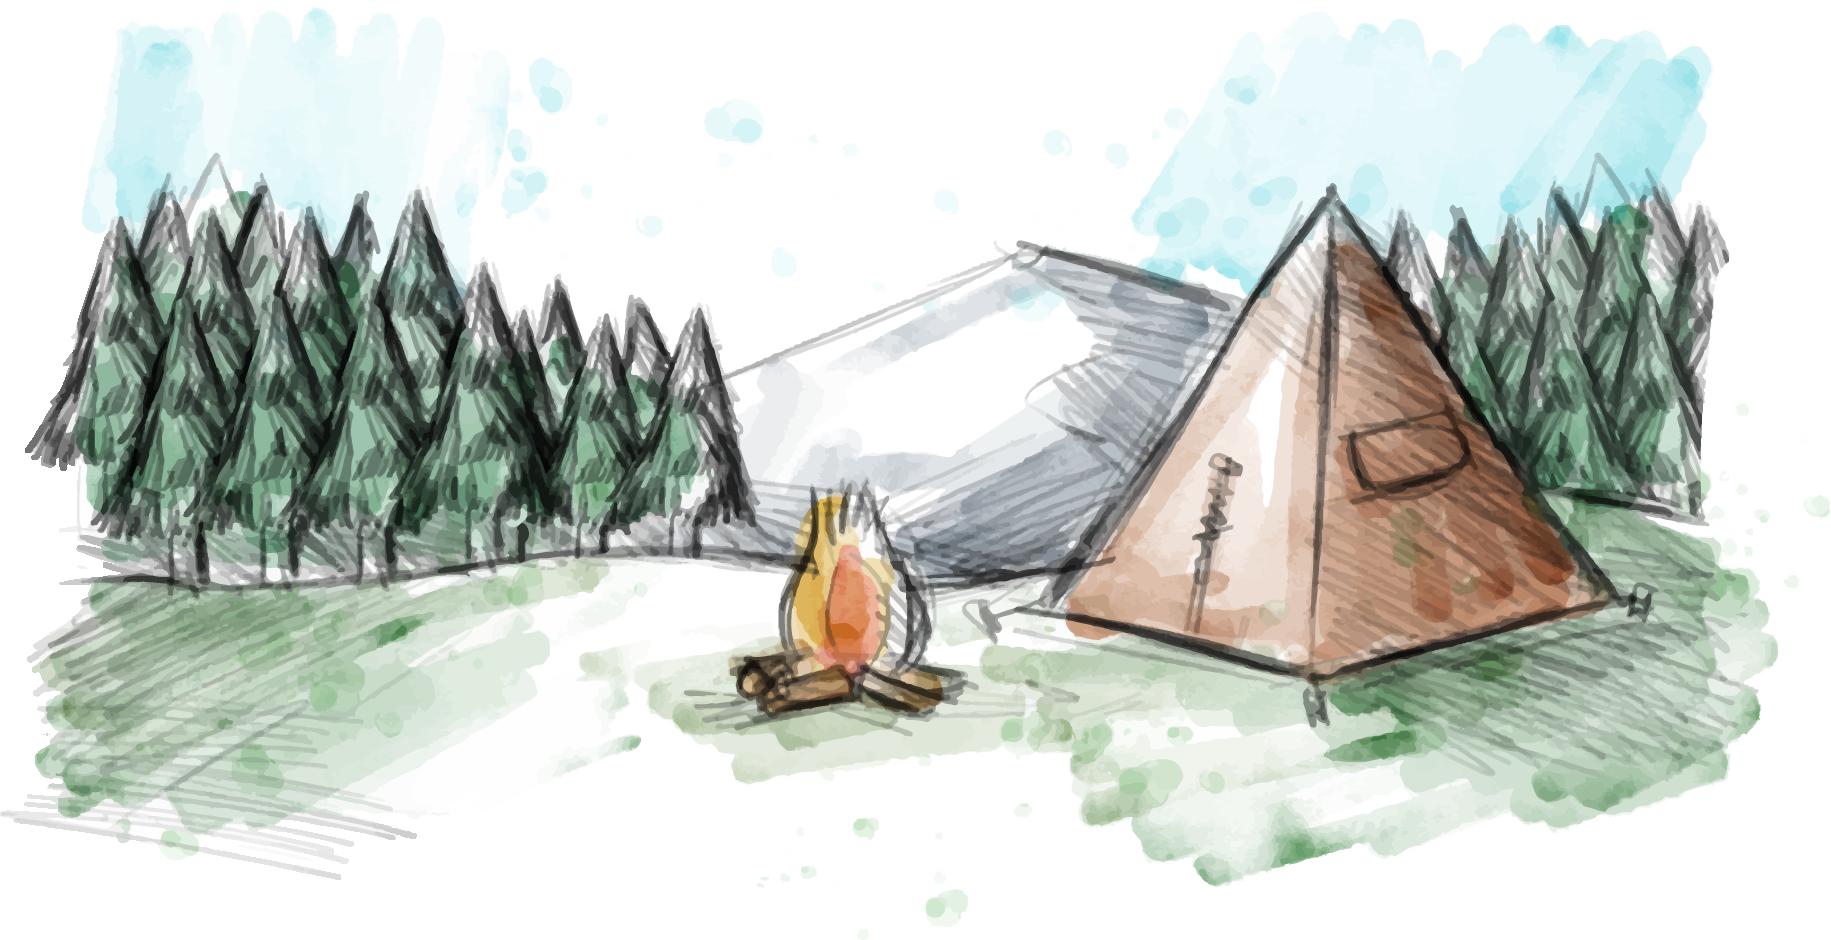 kisspng-madrean-pine-oak-woodlands-camping-watercolor-pain-watercolor-graffiti-5a917677c42f92.6356751315194824878036.png